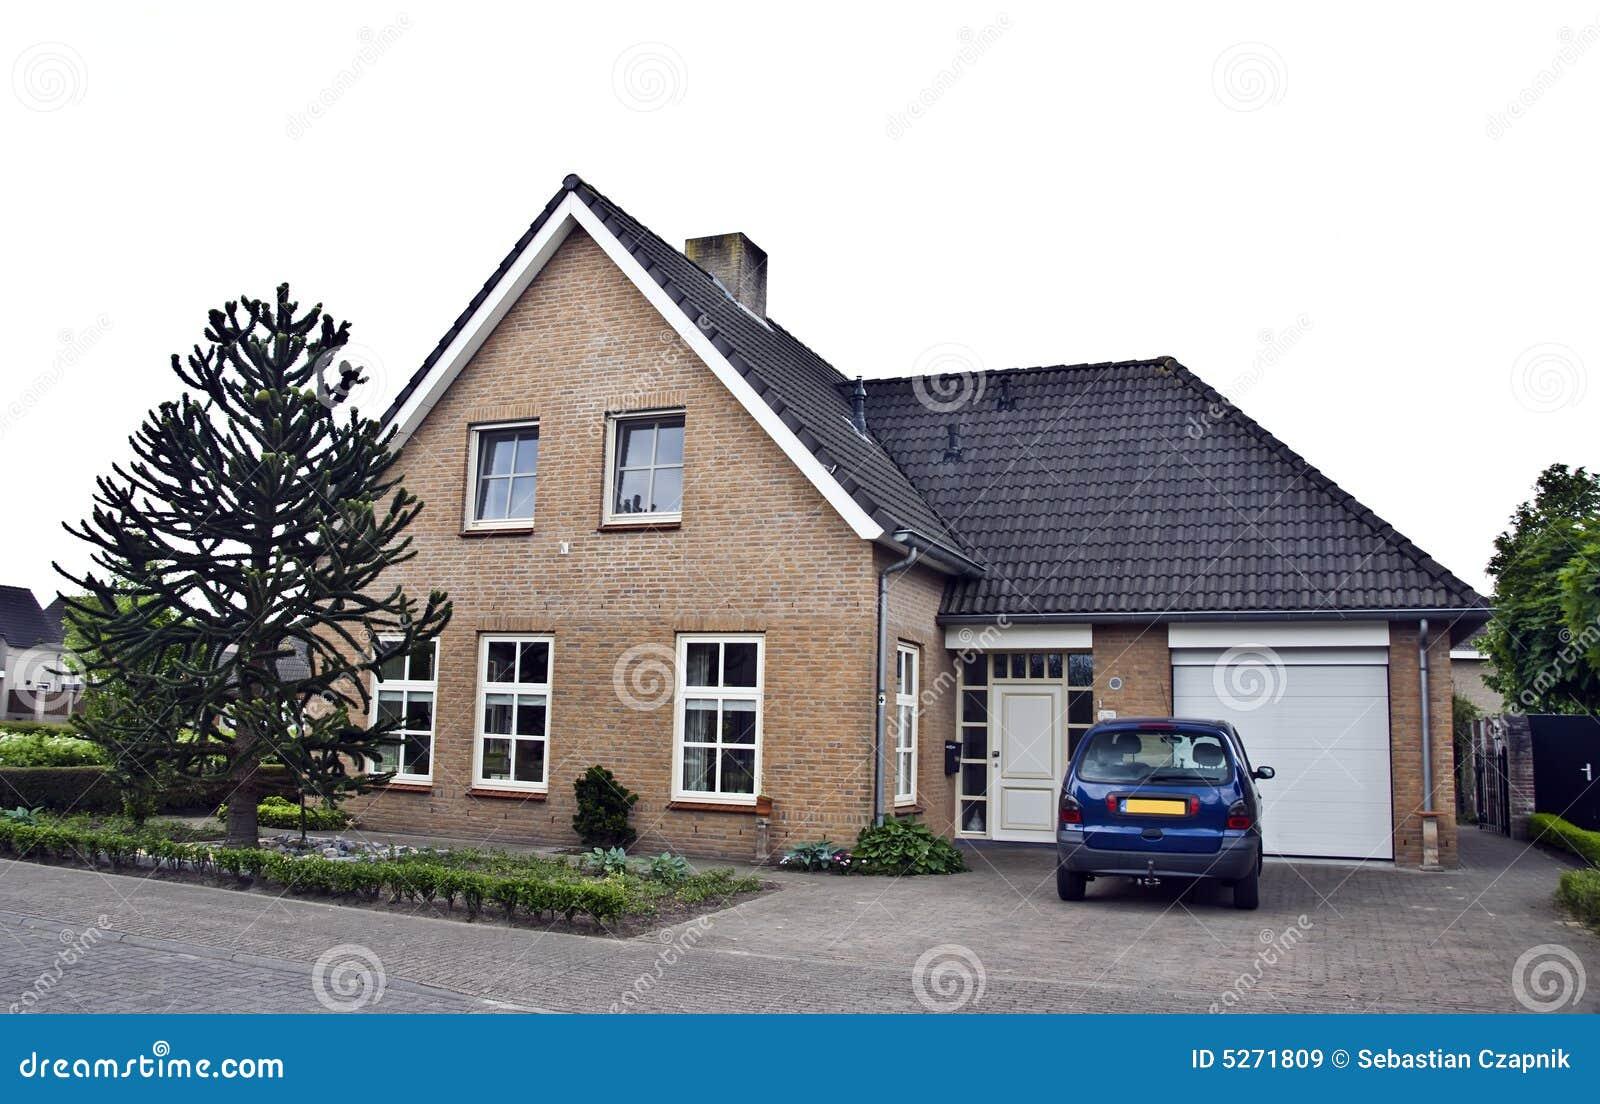 Moderne huis en tuin